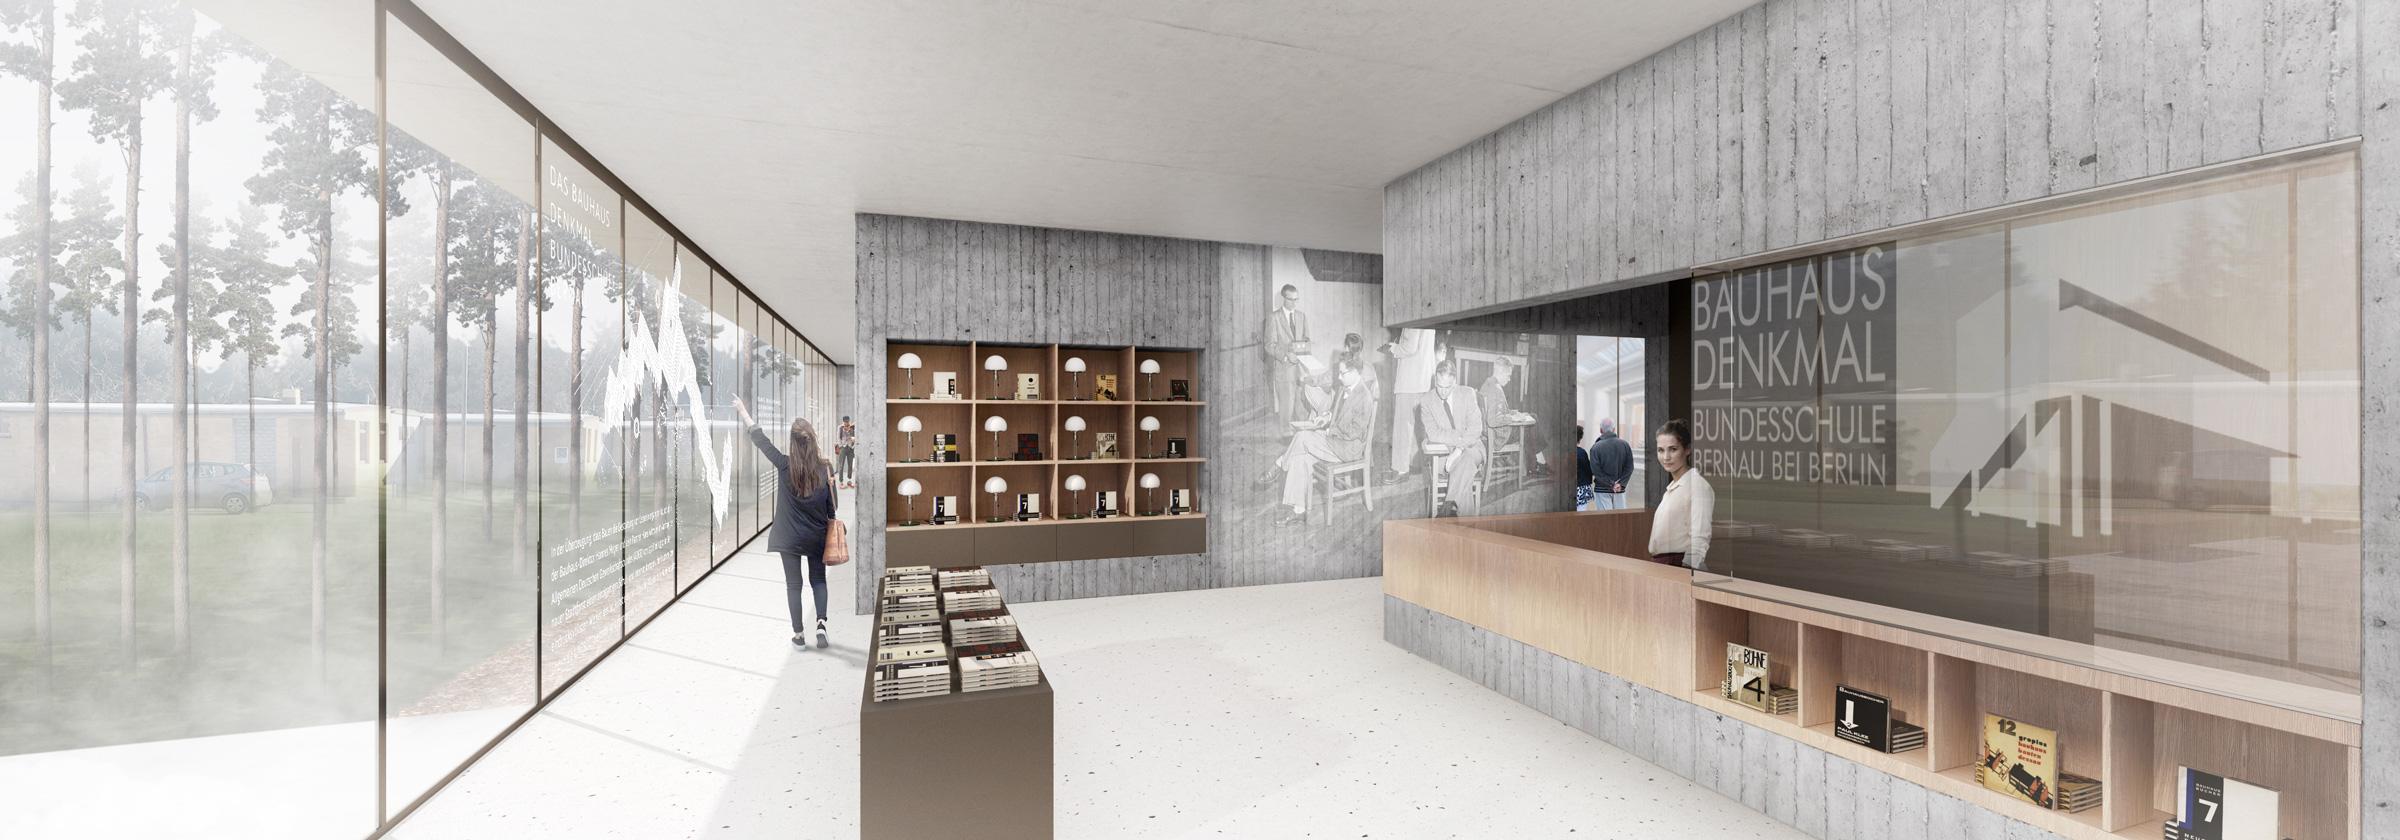 Interior view: Reception and shop area